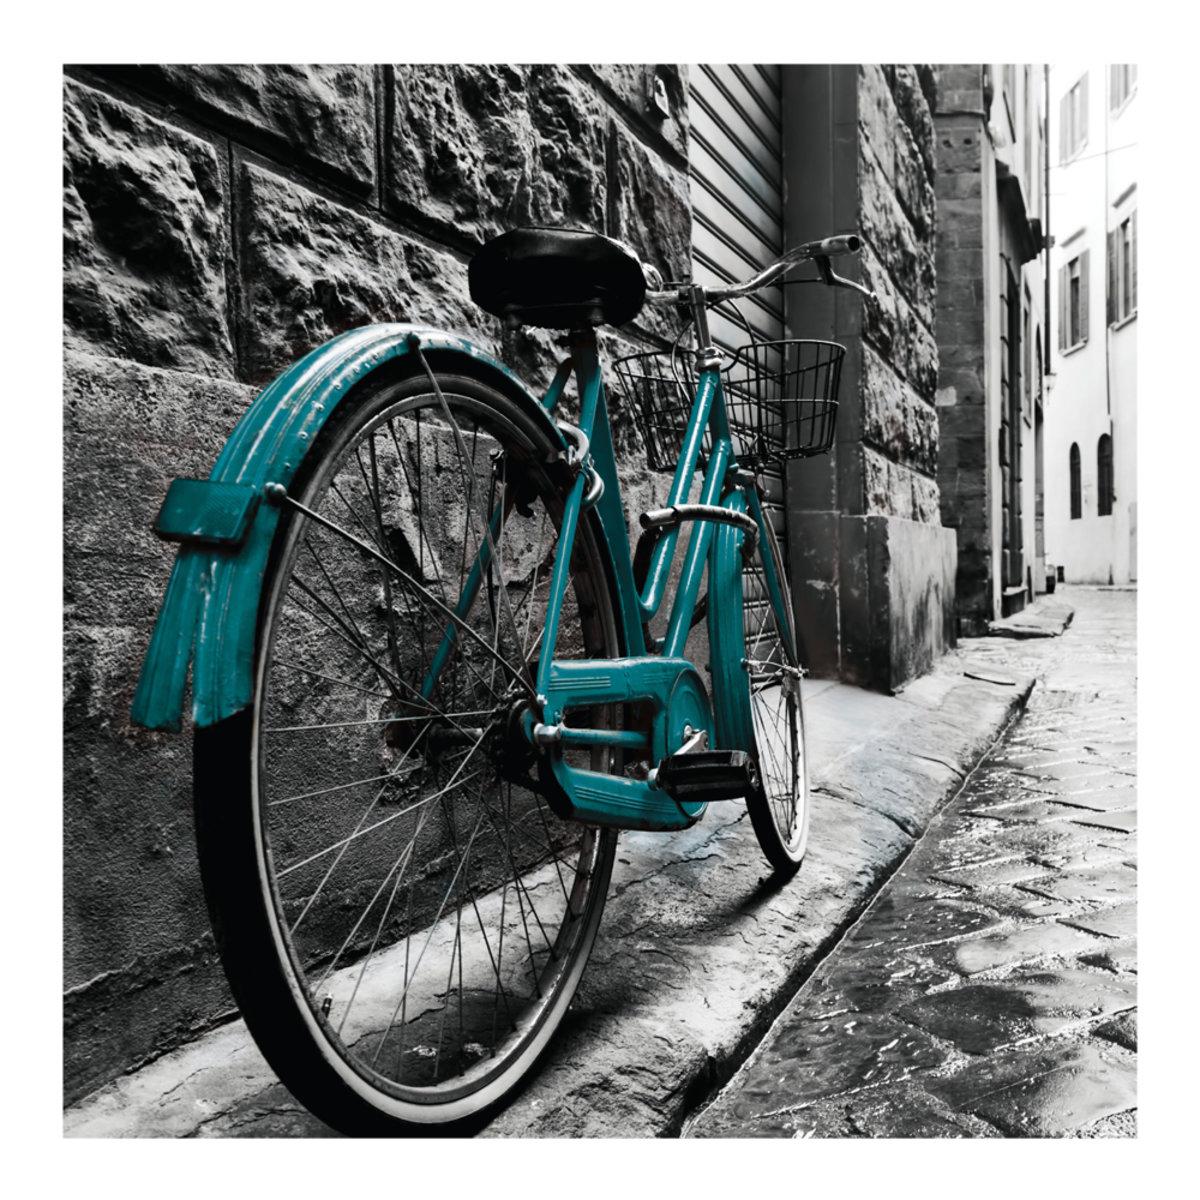 Cuadro Decorativo  Bicicleta P40X40 1 Pieza Crown Baccara